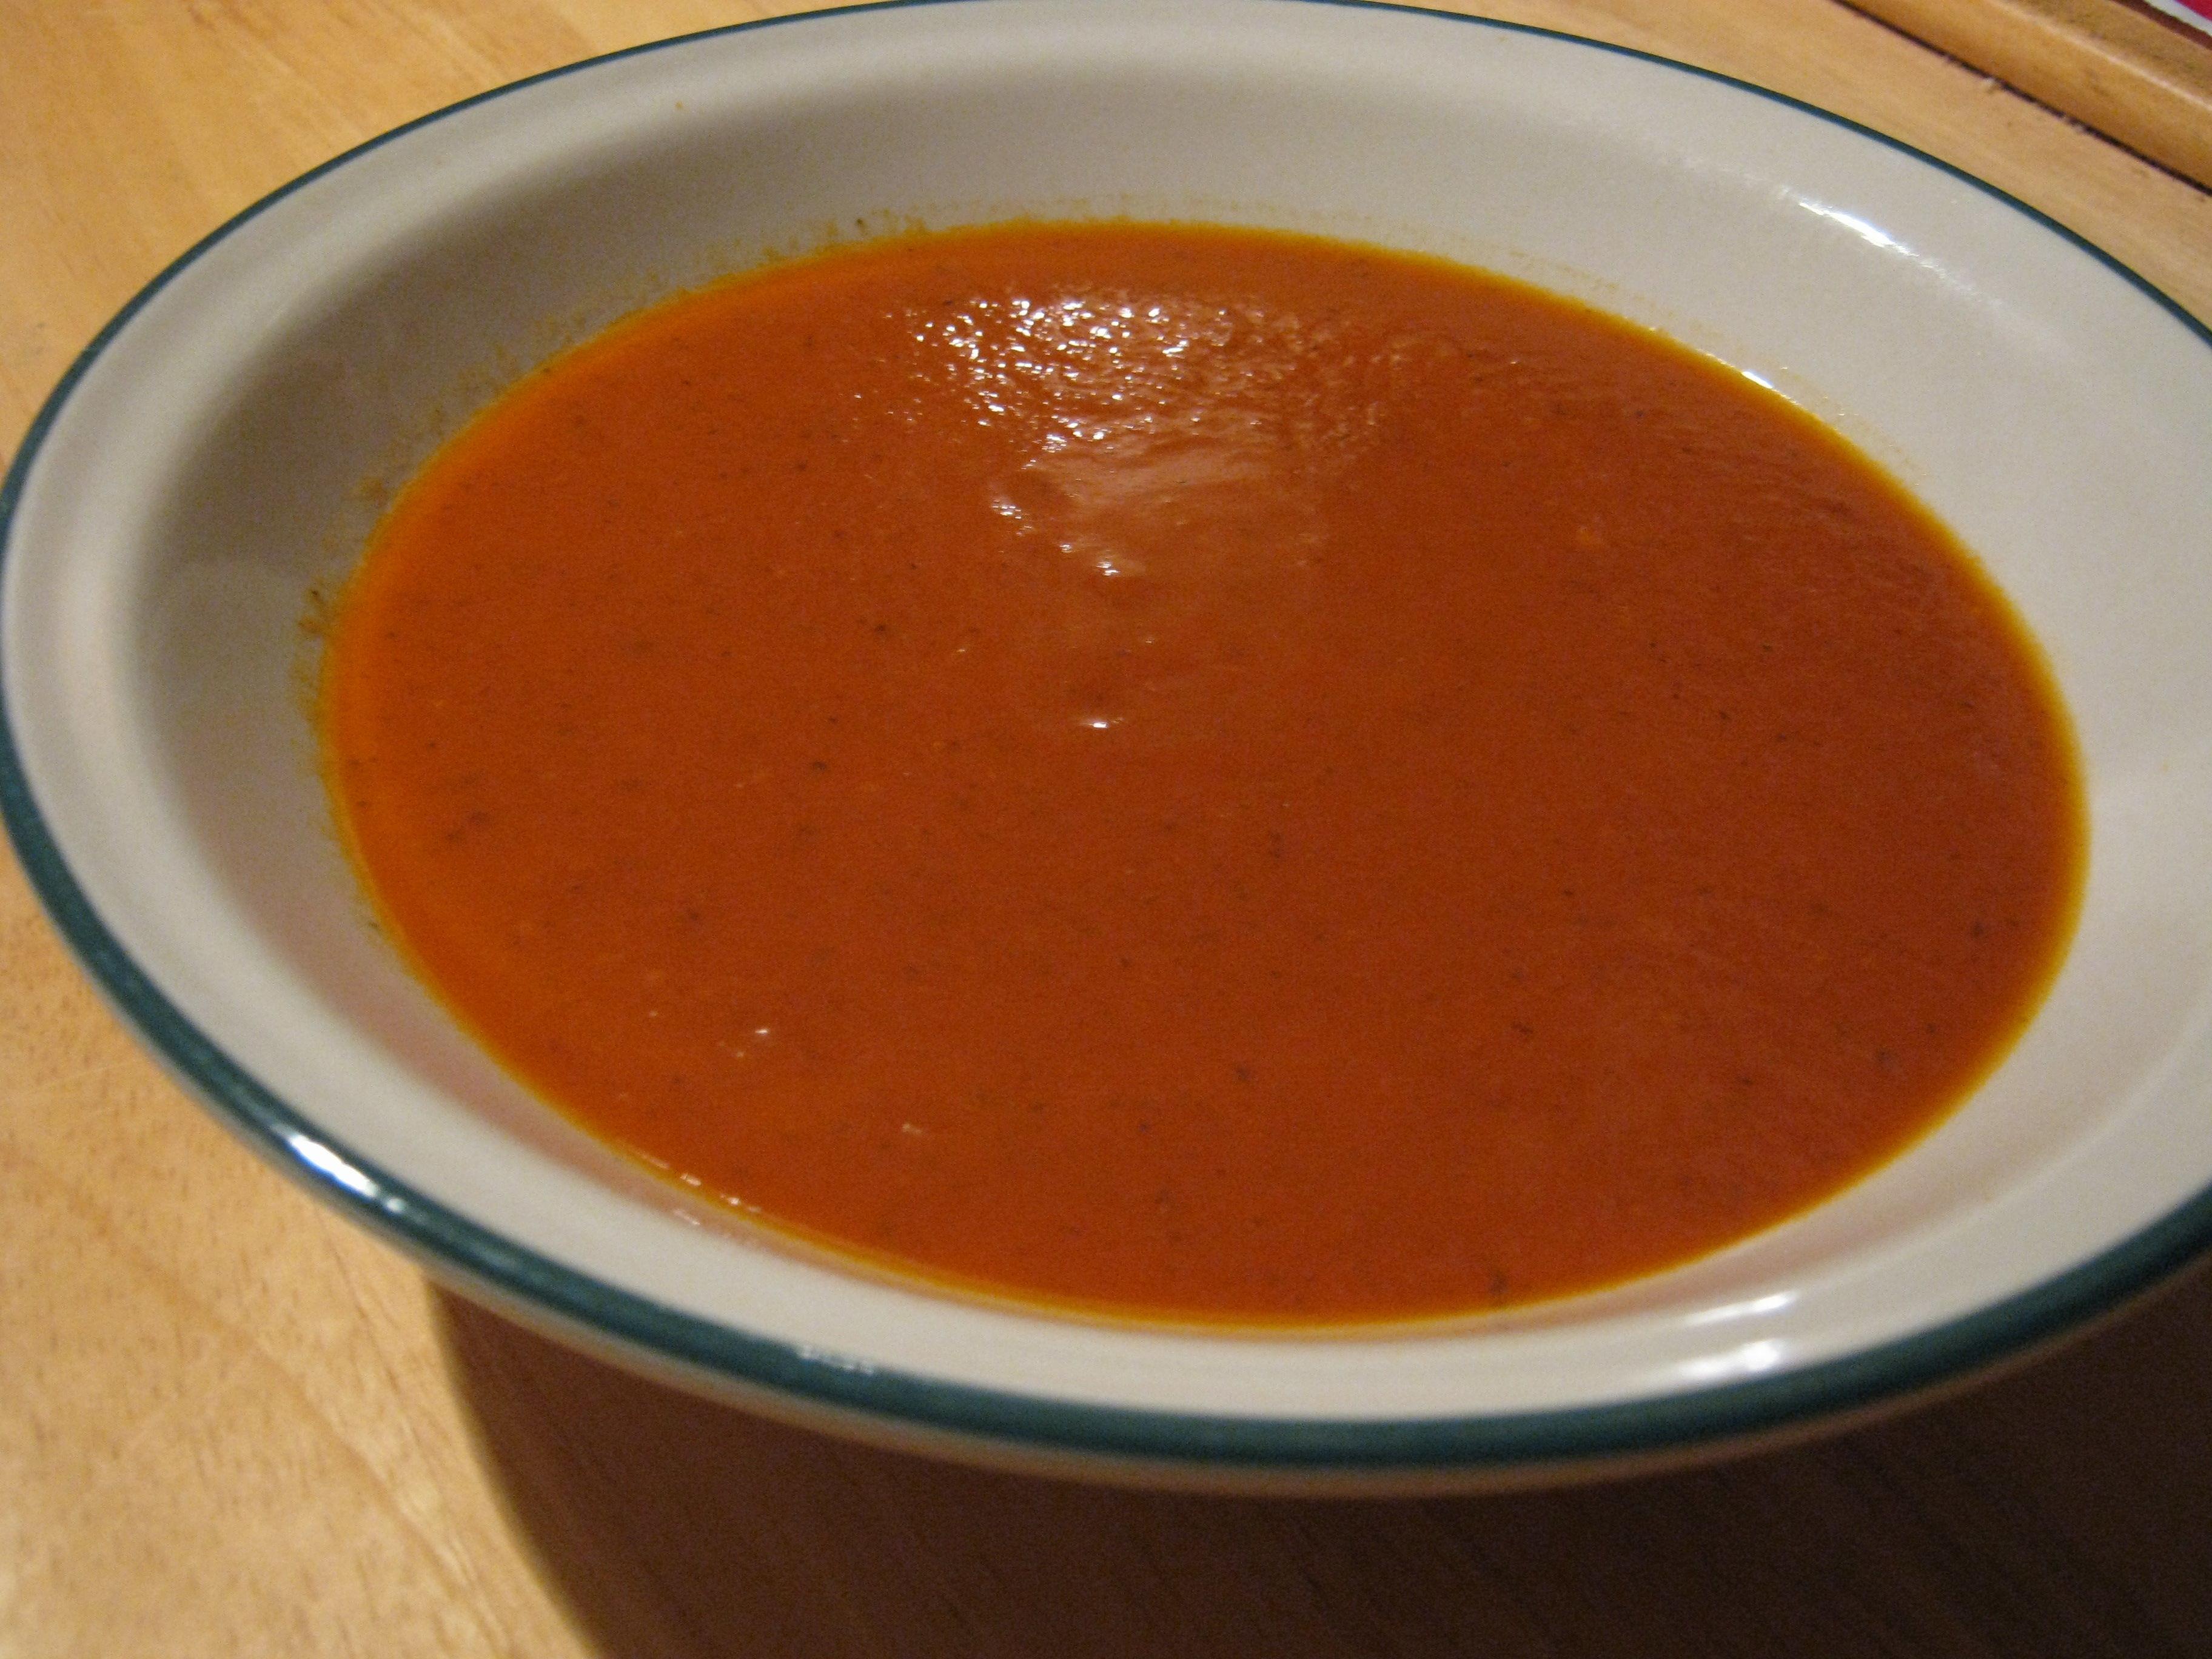 Vegan Tomato Soup Recipes  Vegan tomato soup recipe All recipes UK